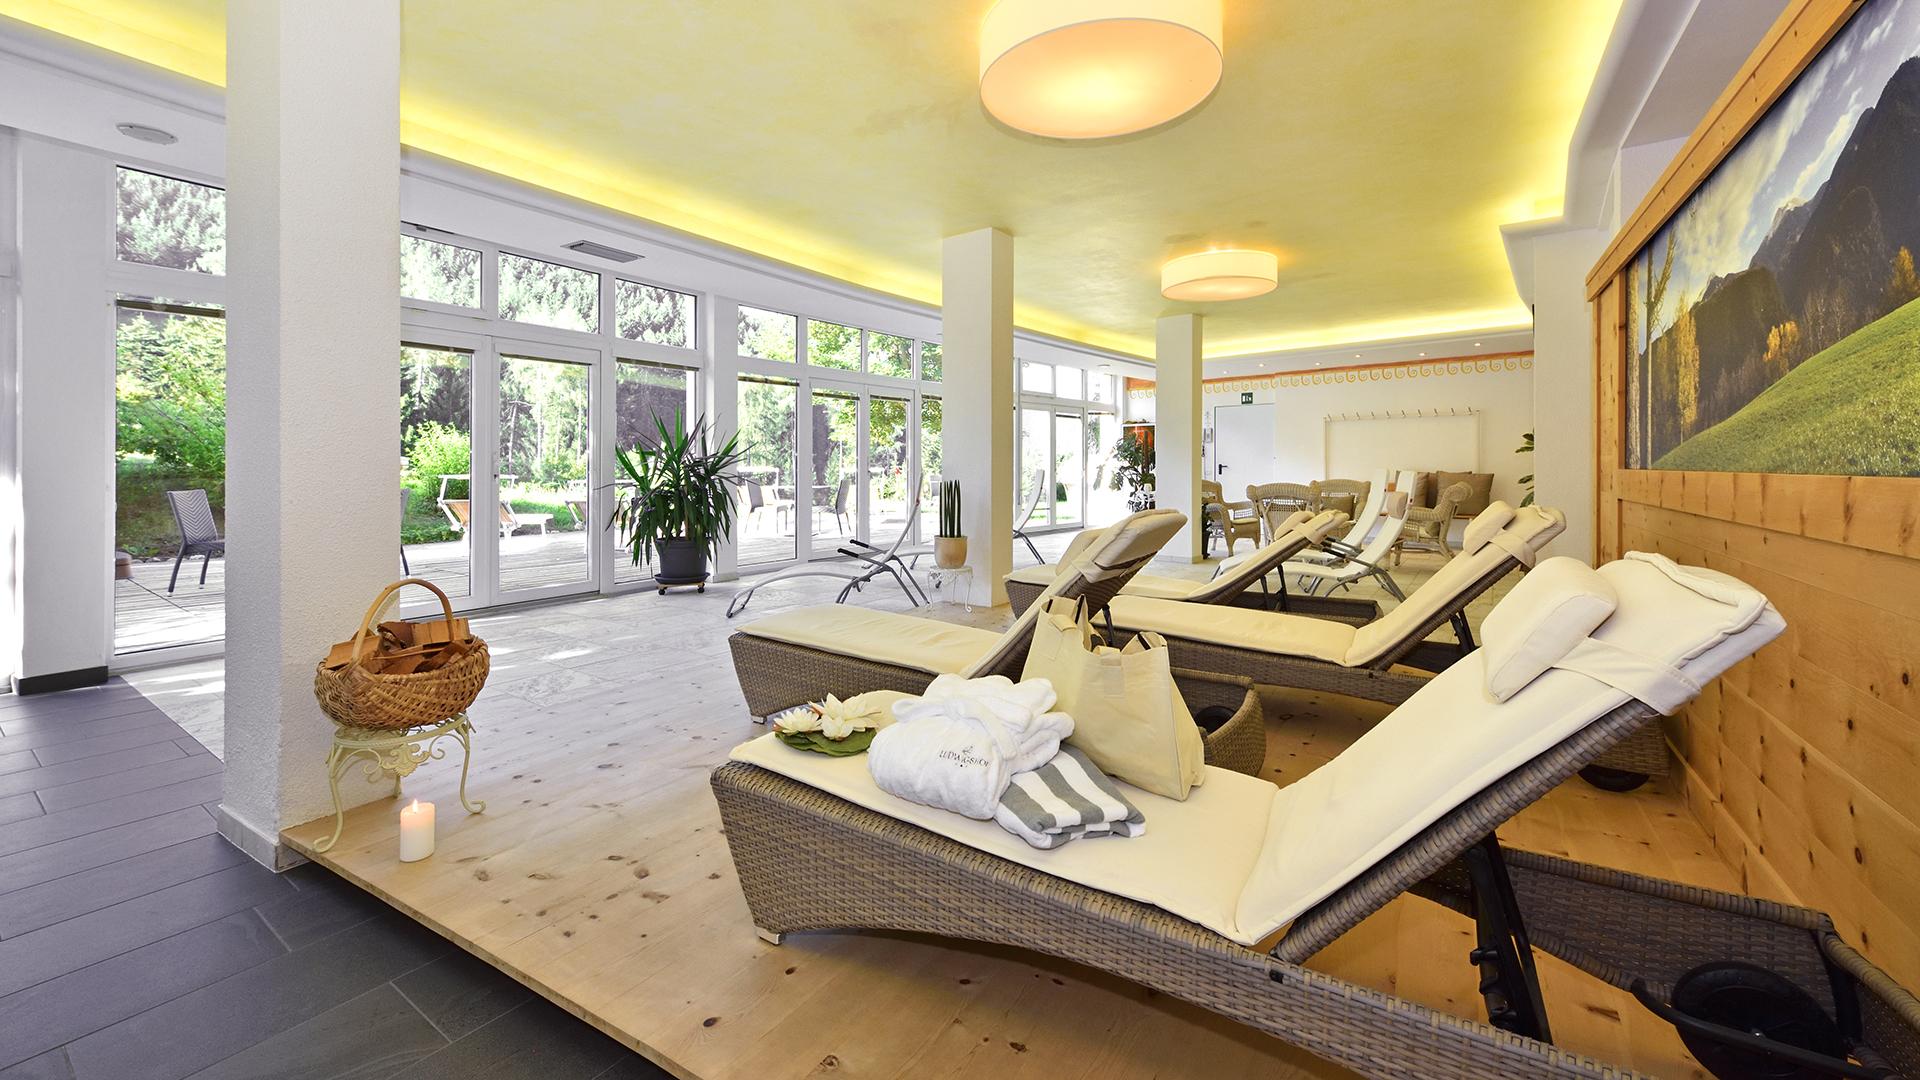 wellness bozen und umgebung verw hnurlaub im ludwigshof. Black Bedroom Furniture Sets. Home Design Ideas